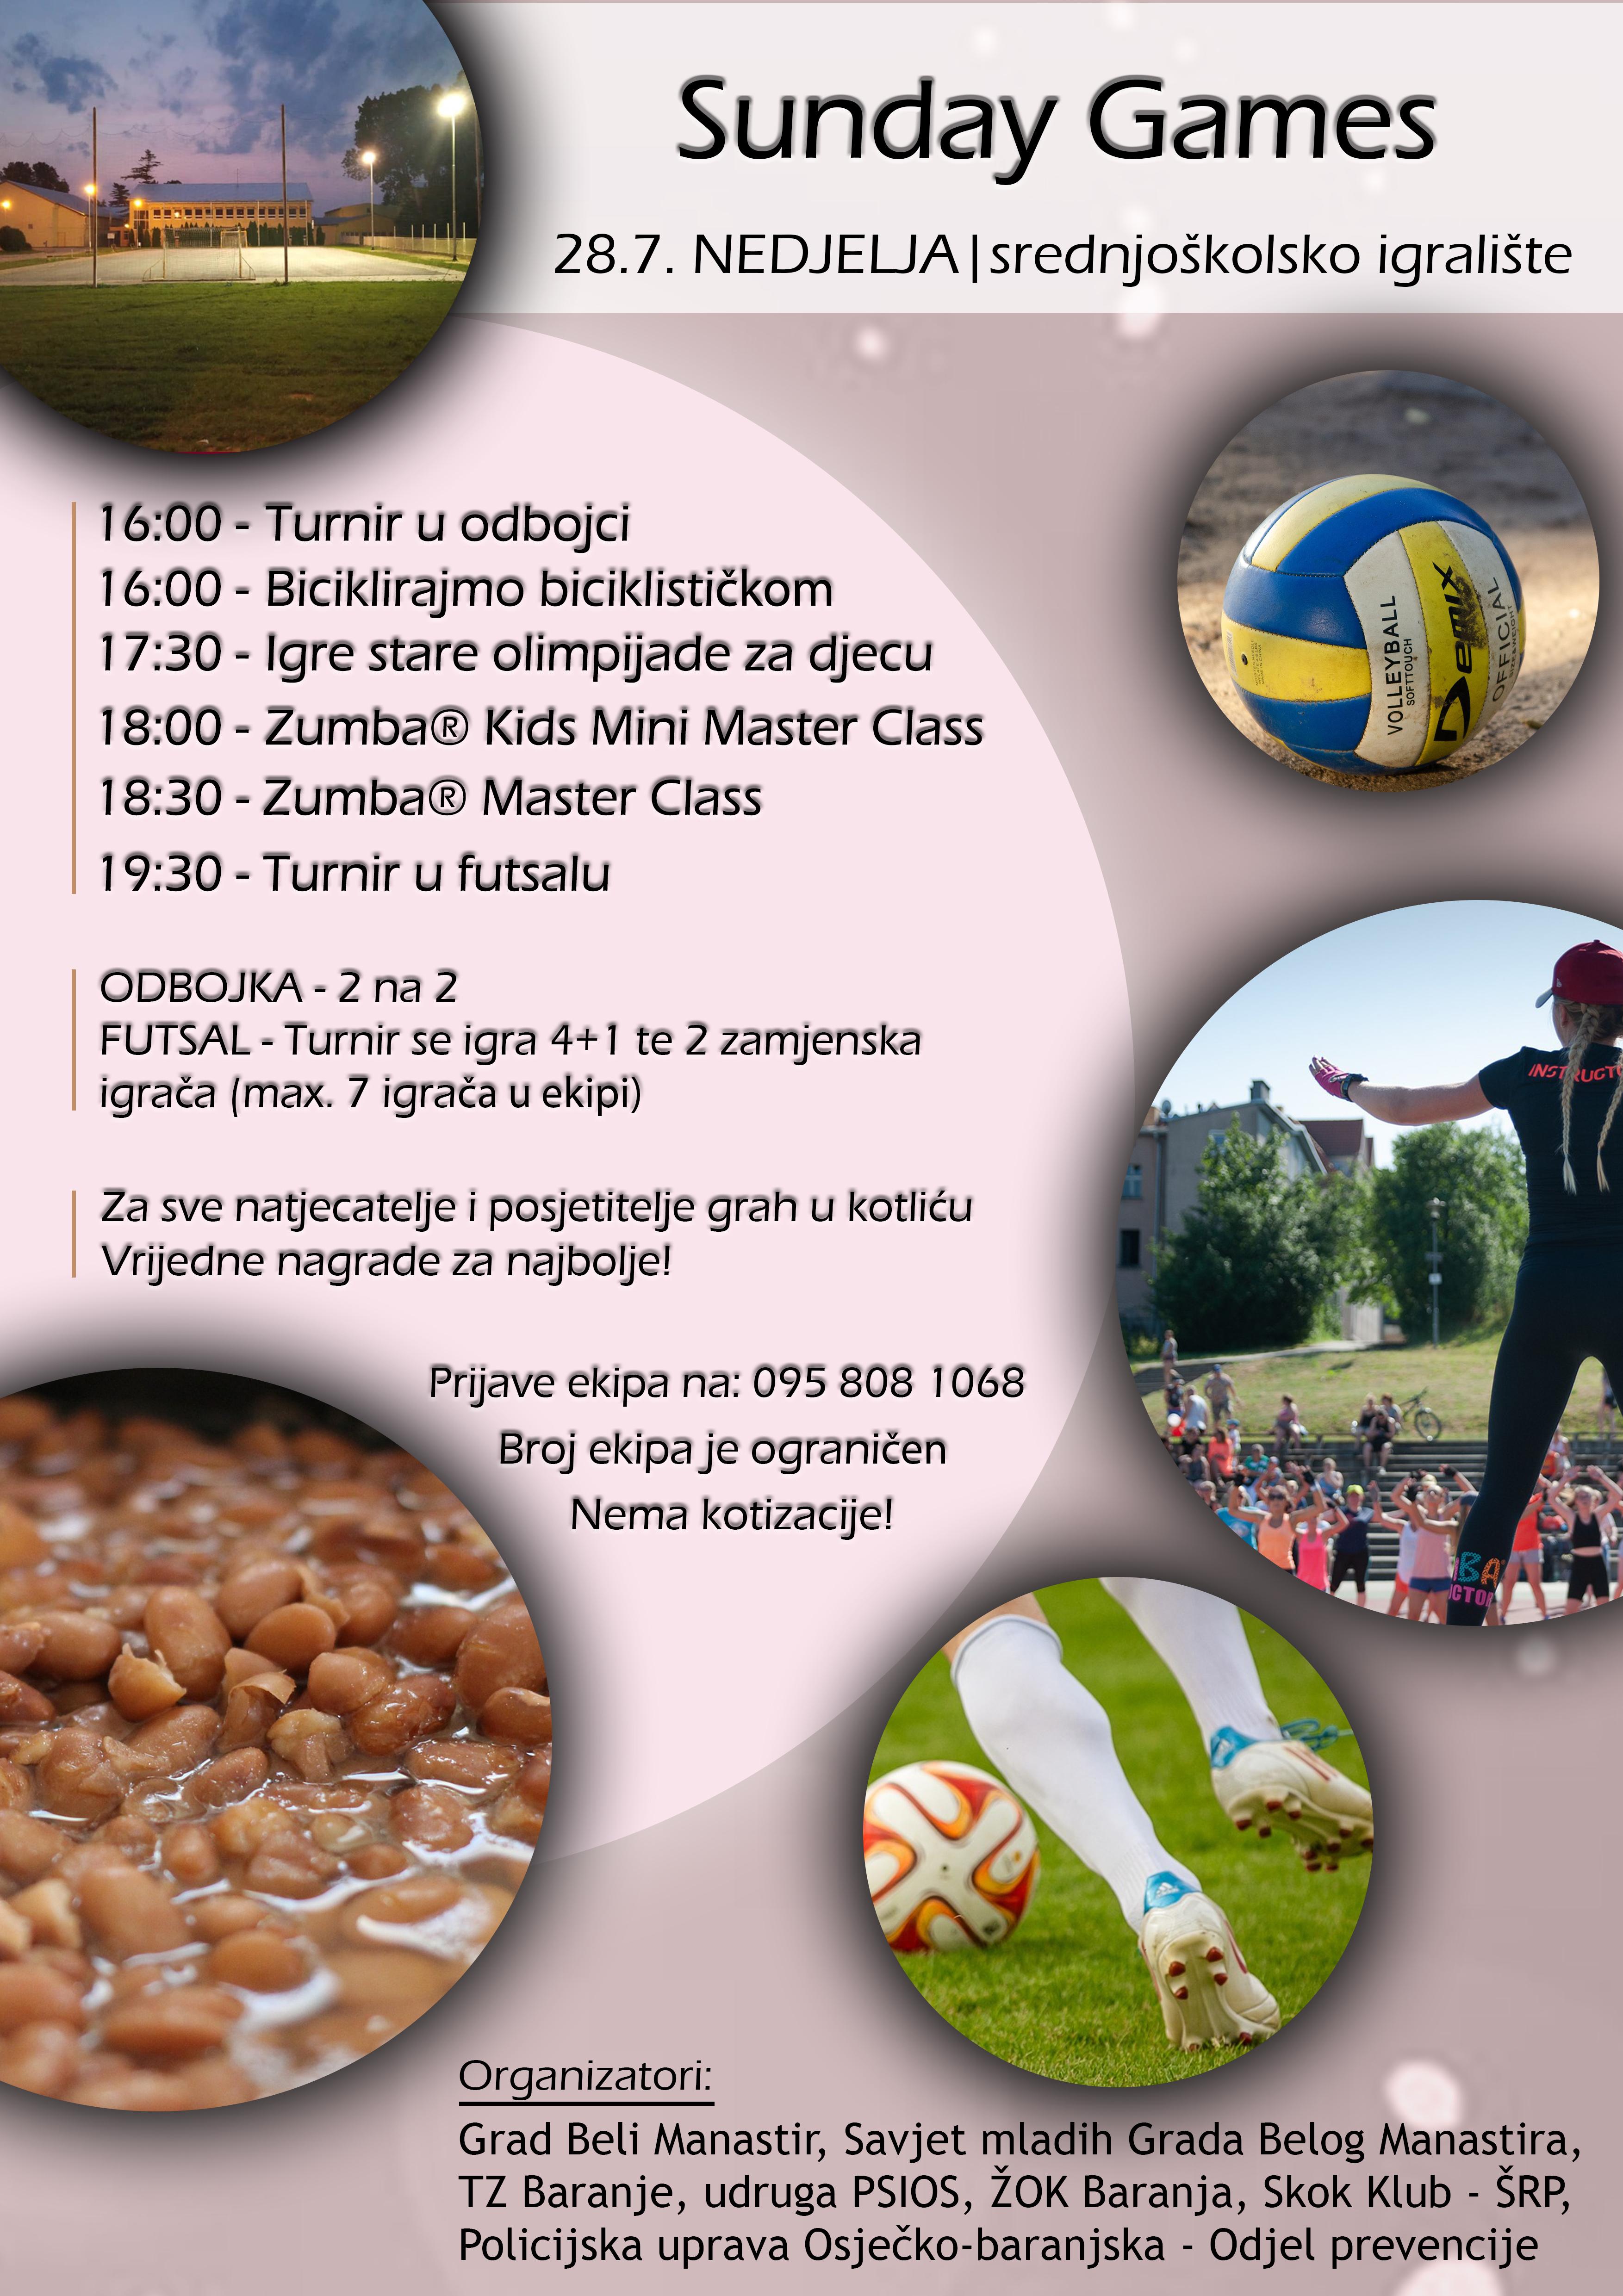 sunday_games_beli_manastir_24072019_osijeknews